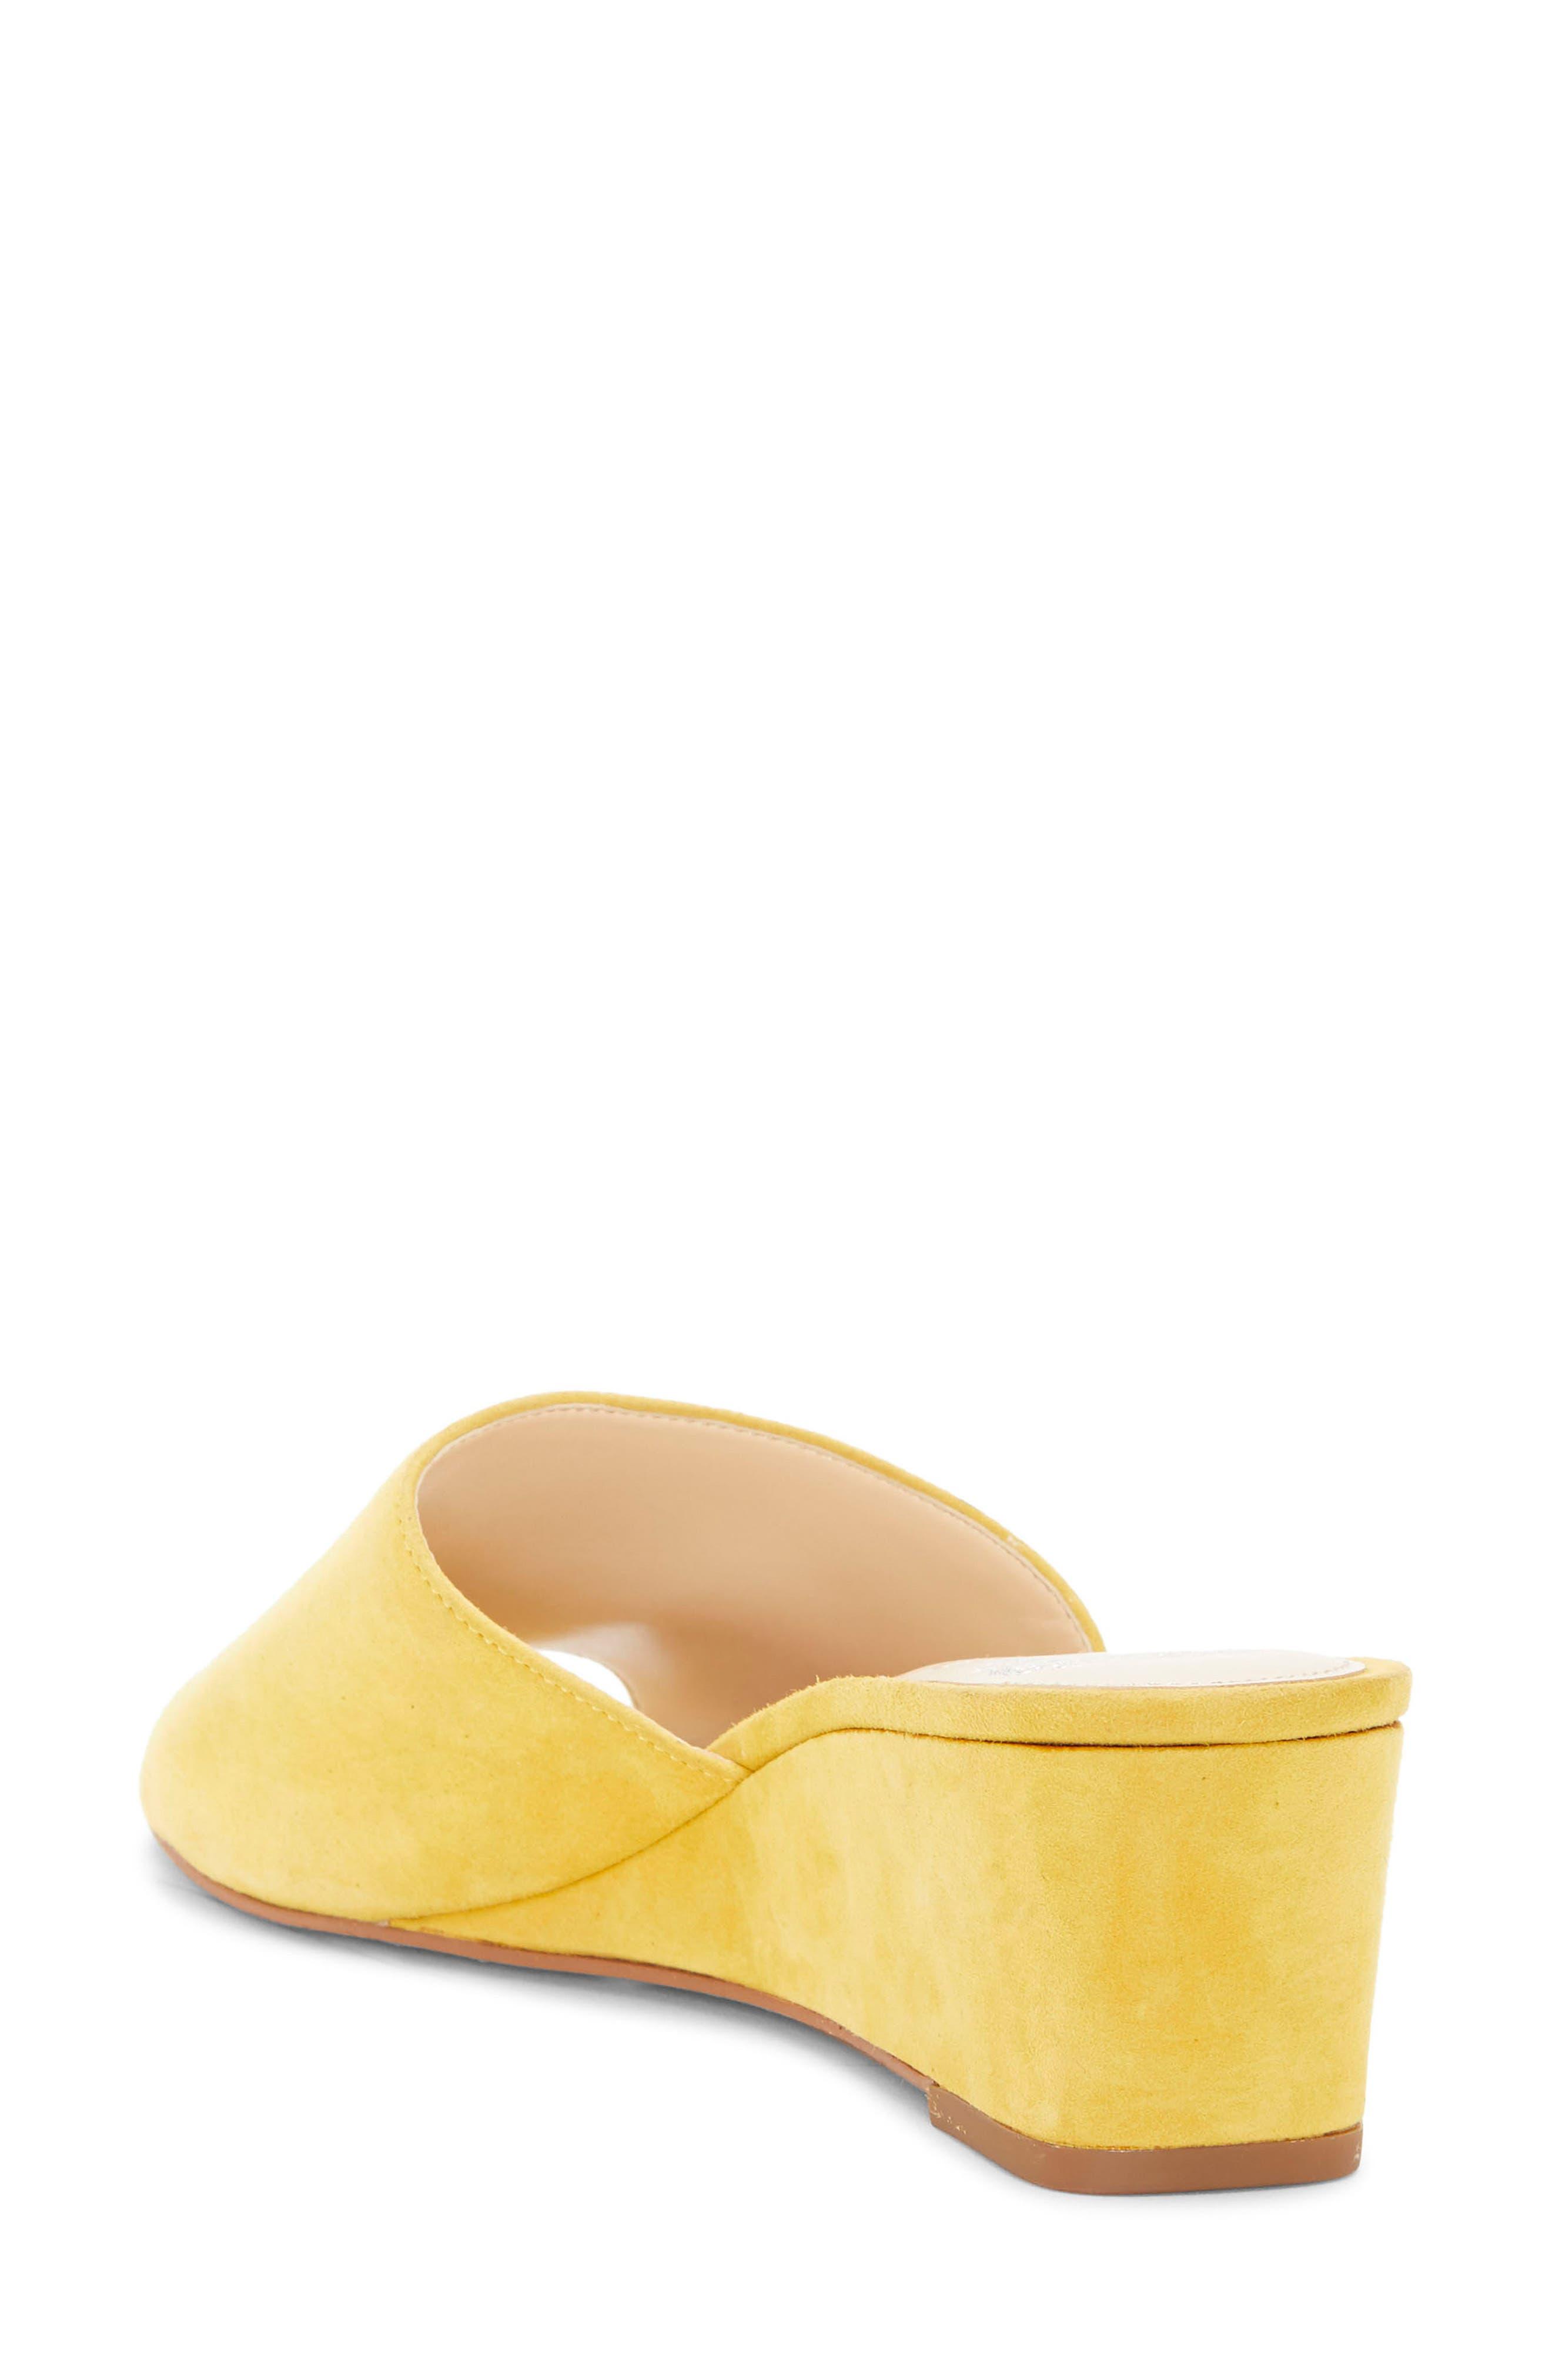 Vince Camuto Slippers Stephena Wedge Slide Sandal